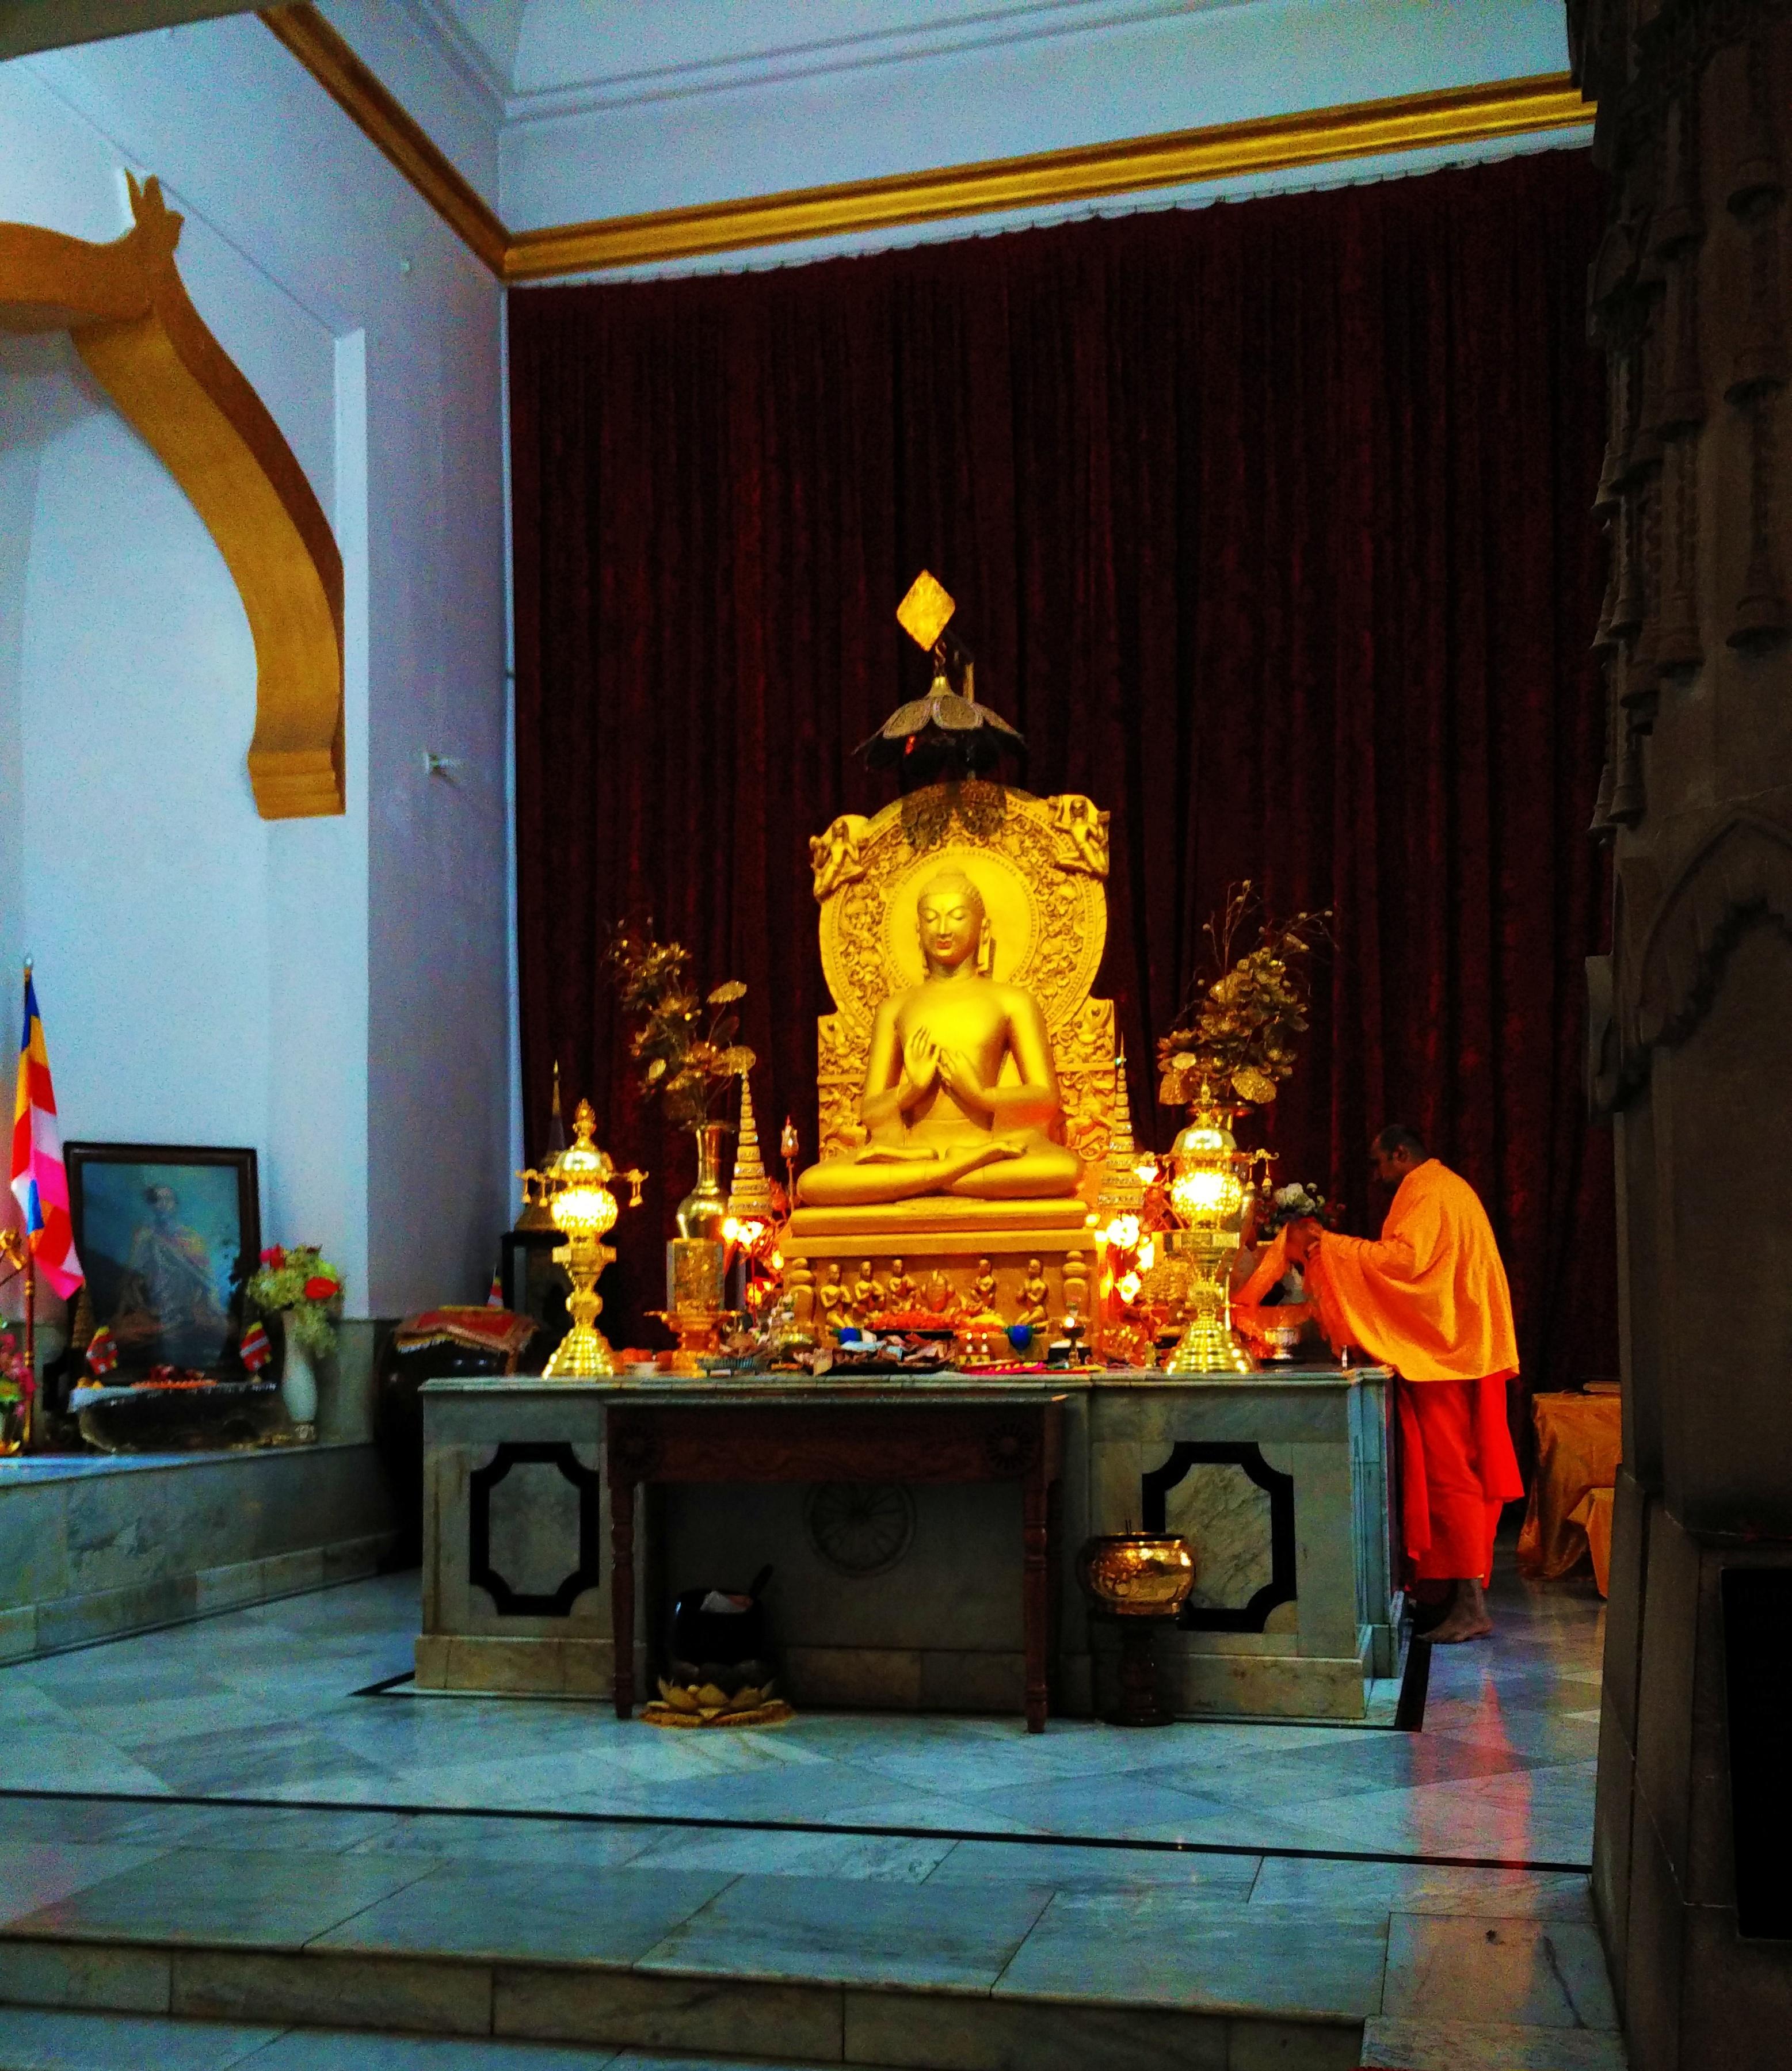 Shakyamuni Buddha, relics, Mulagandha Kuti Vihara, sarnath, varanasi, uttar pradesh, india